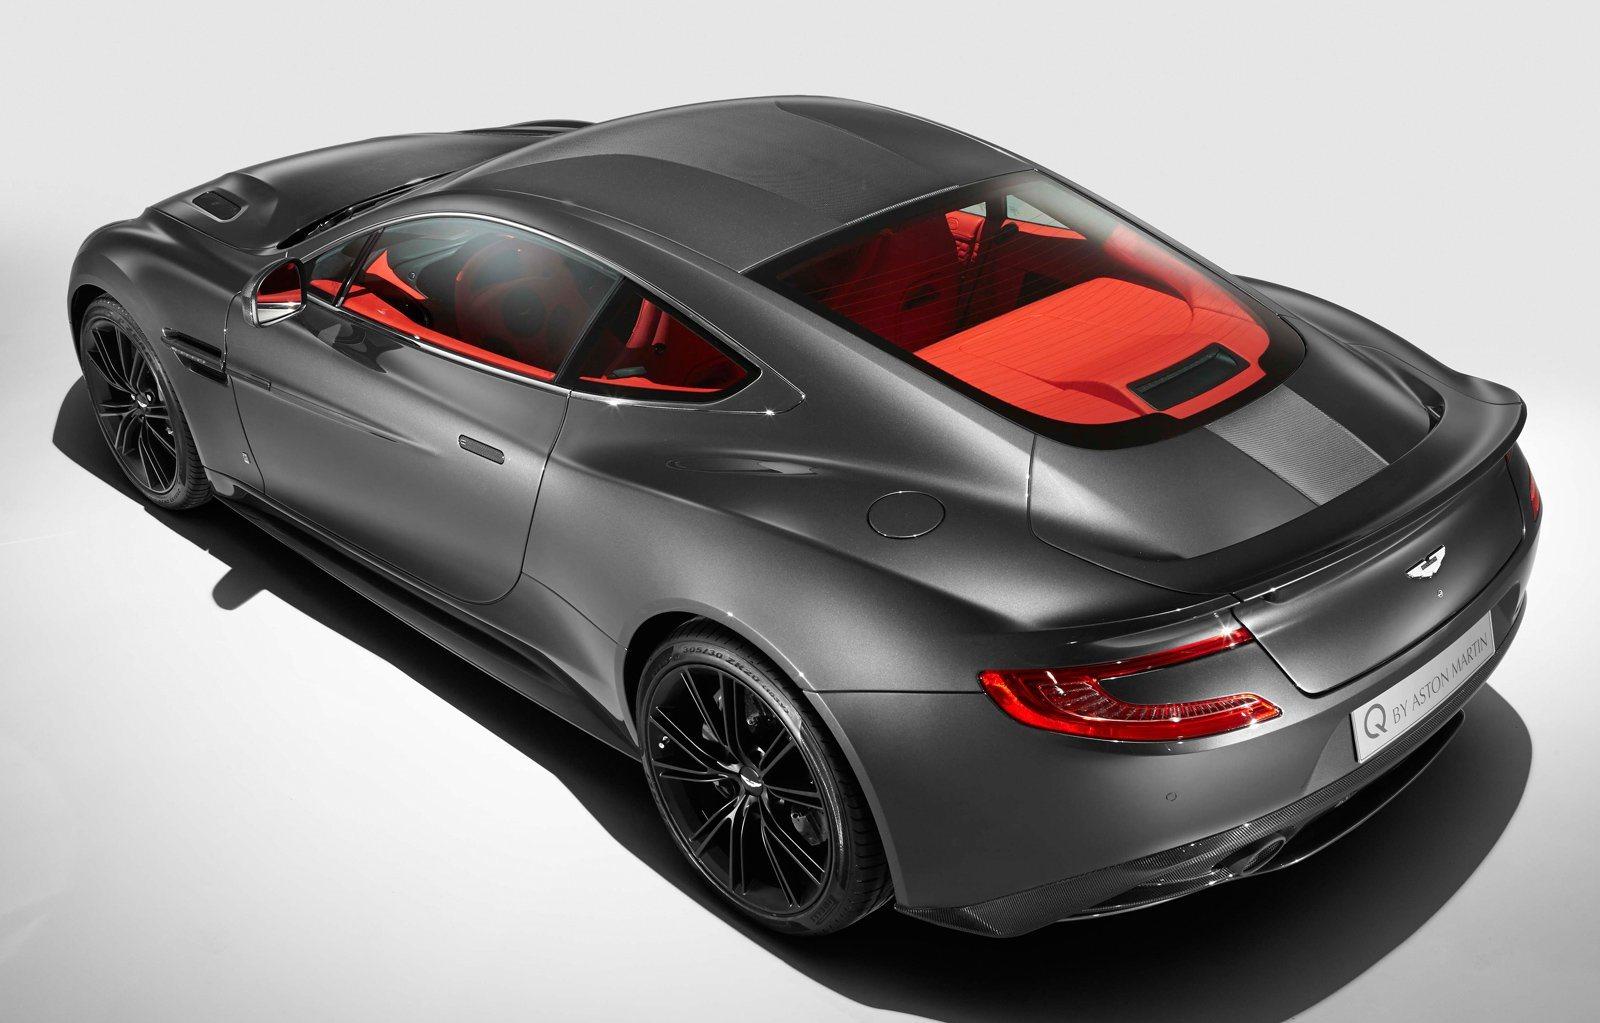 HD Quality Wallpaper | Collection: Vehicles, 1600x1023 Aston Martin Vanquish Q